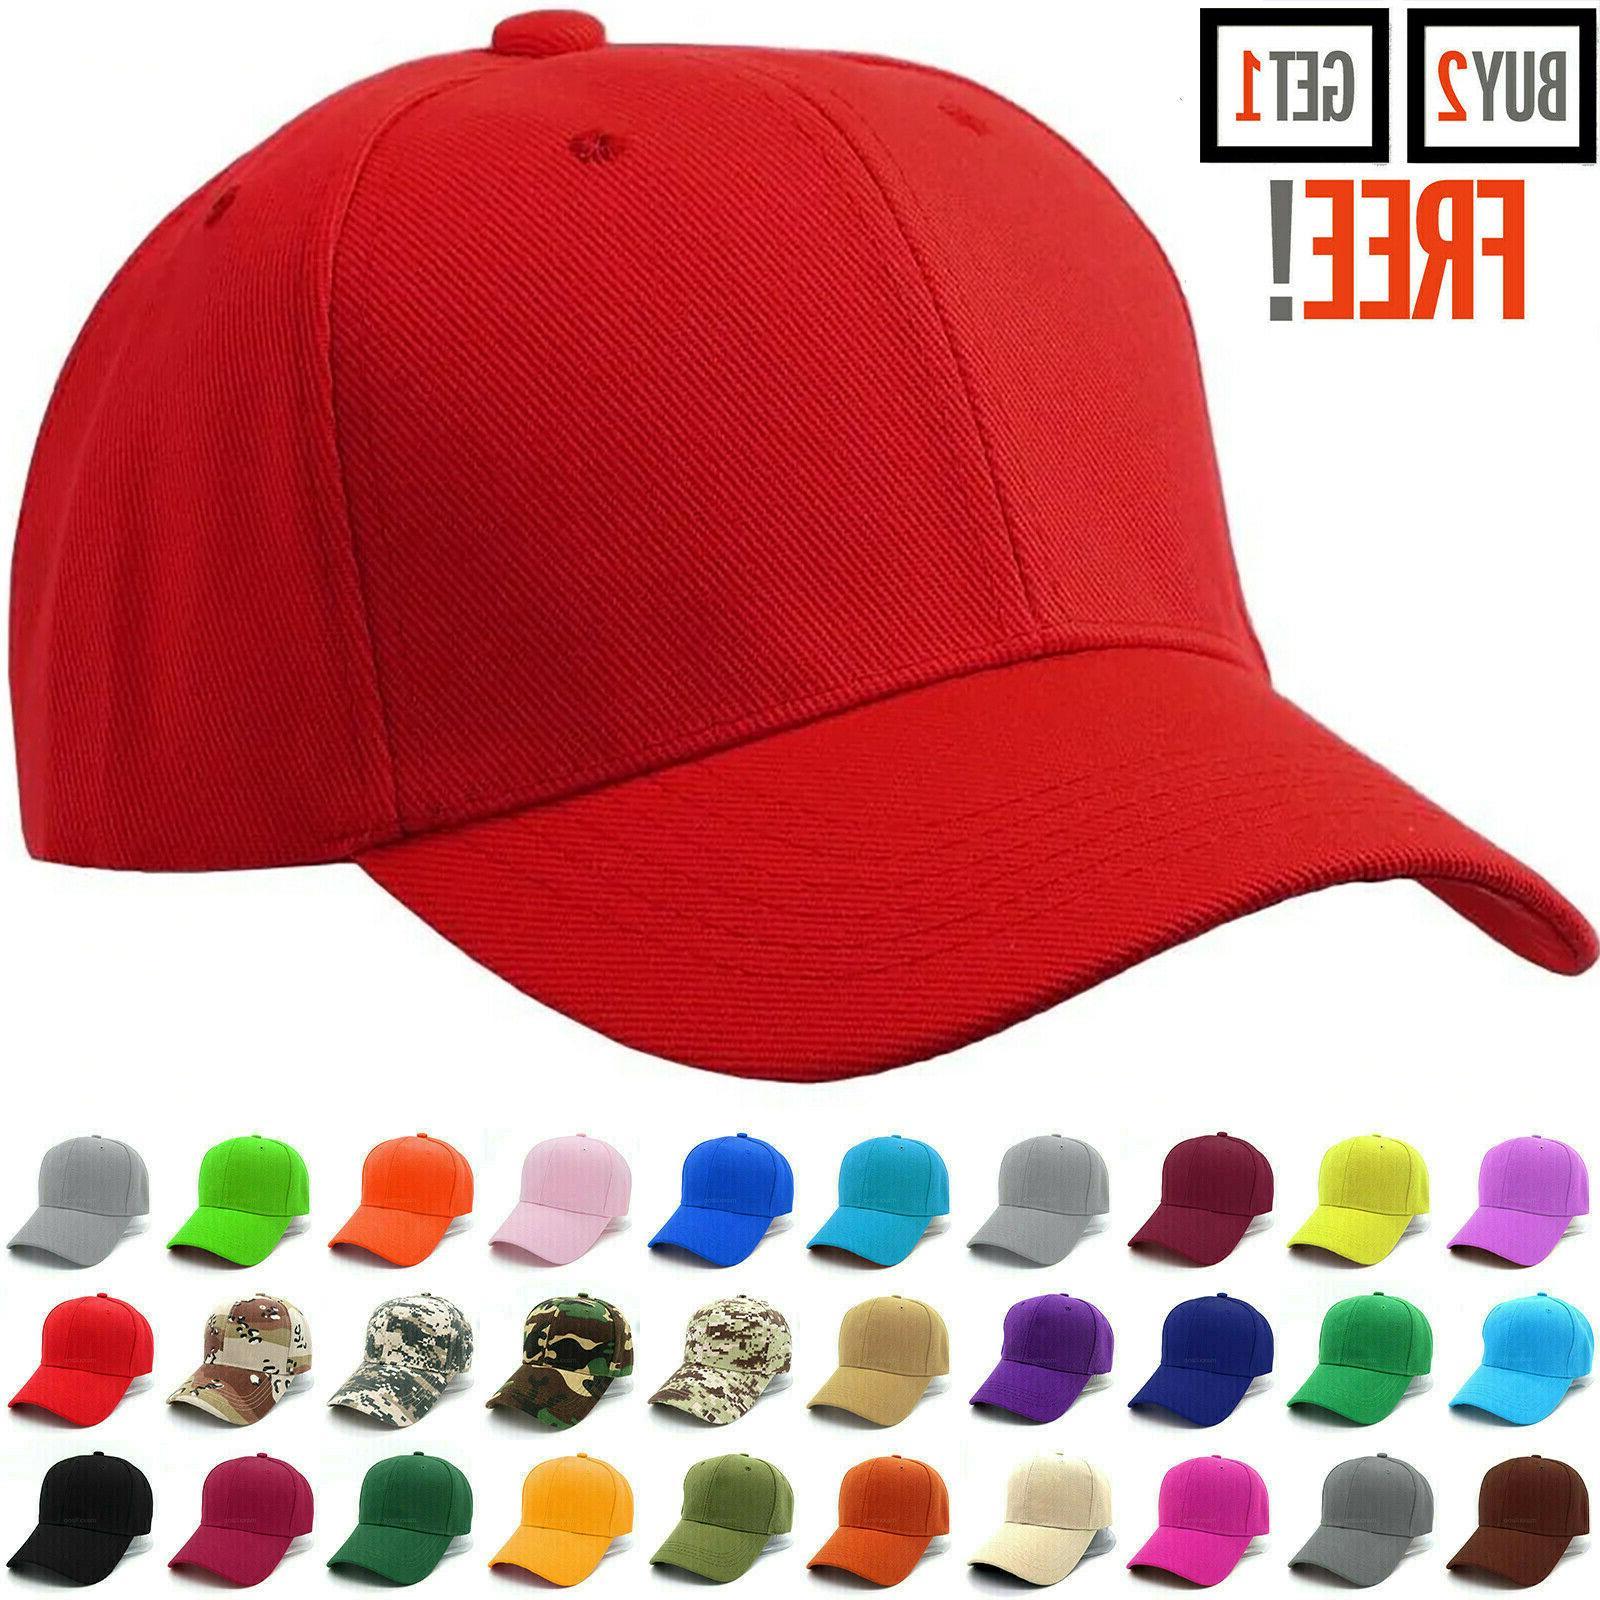 baseball cap plain blank strapback adjustable solid